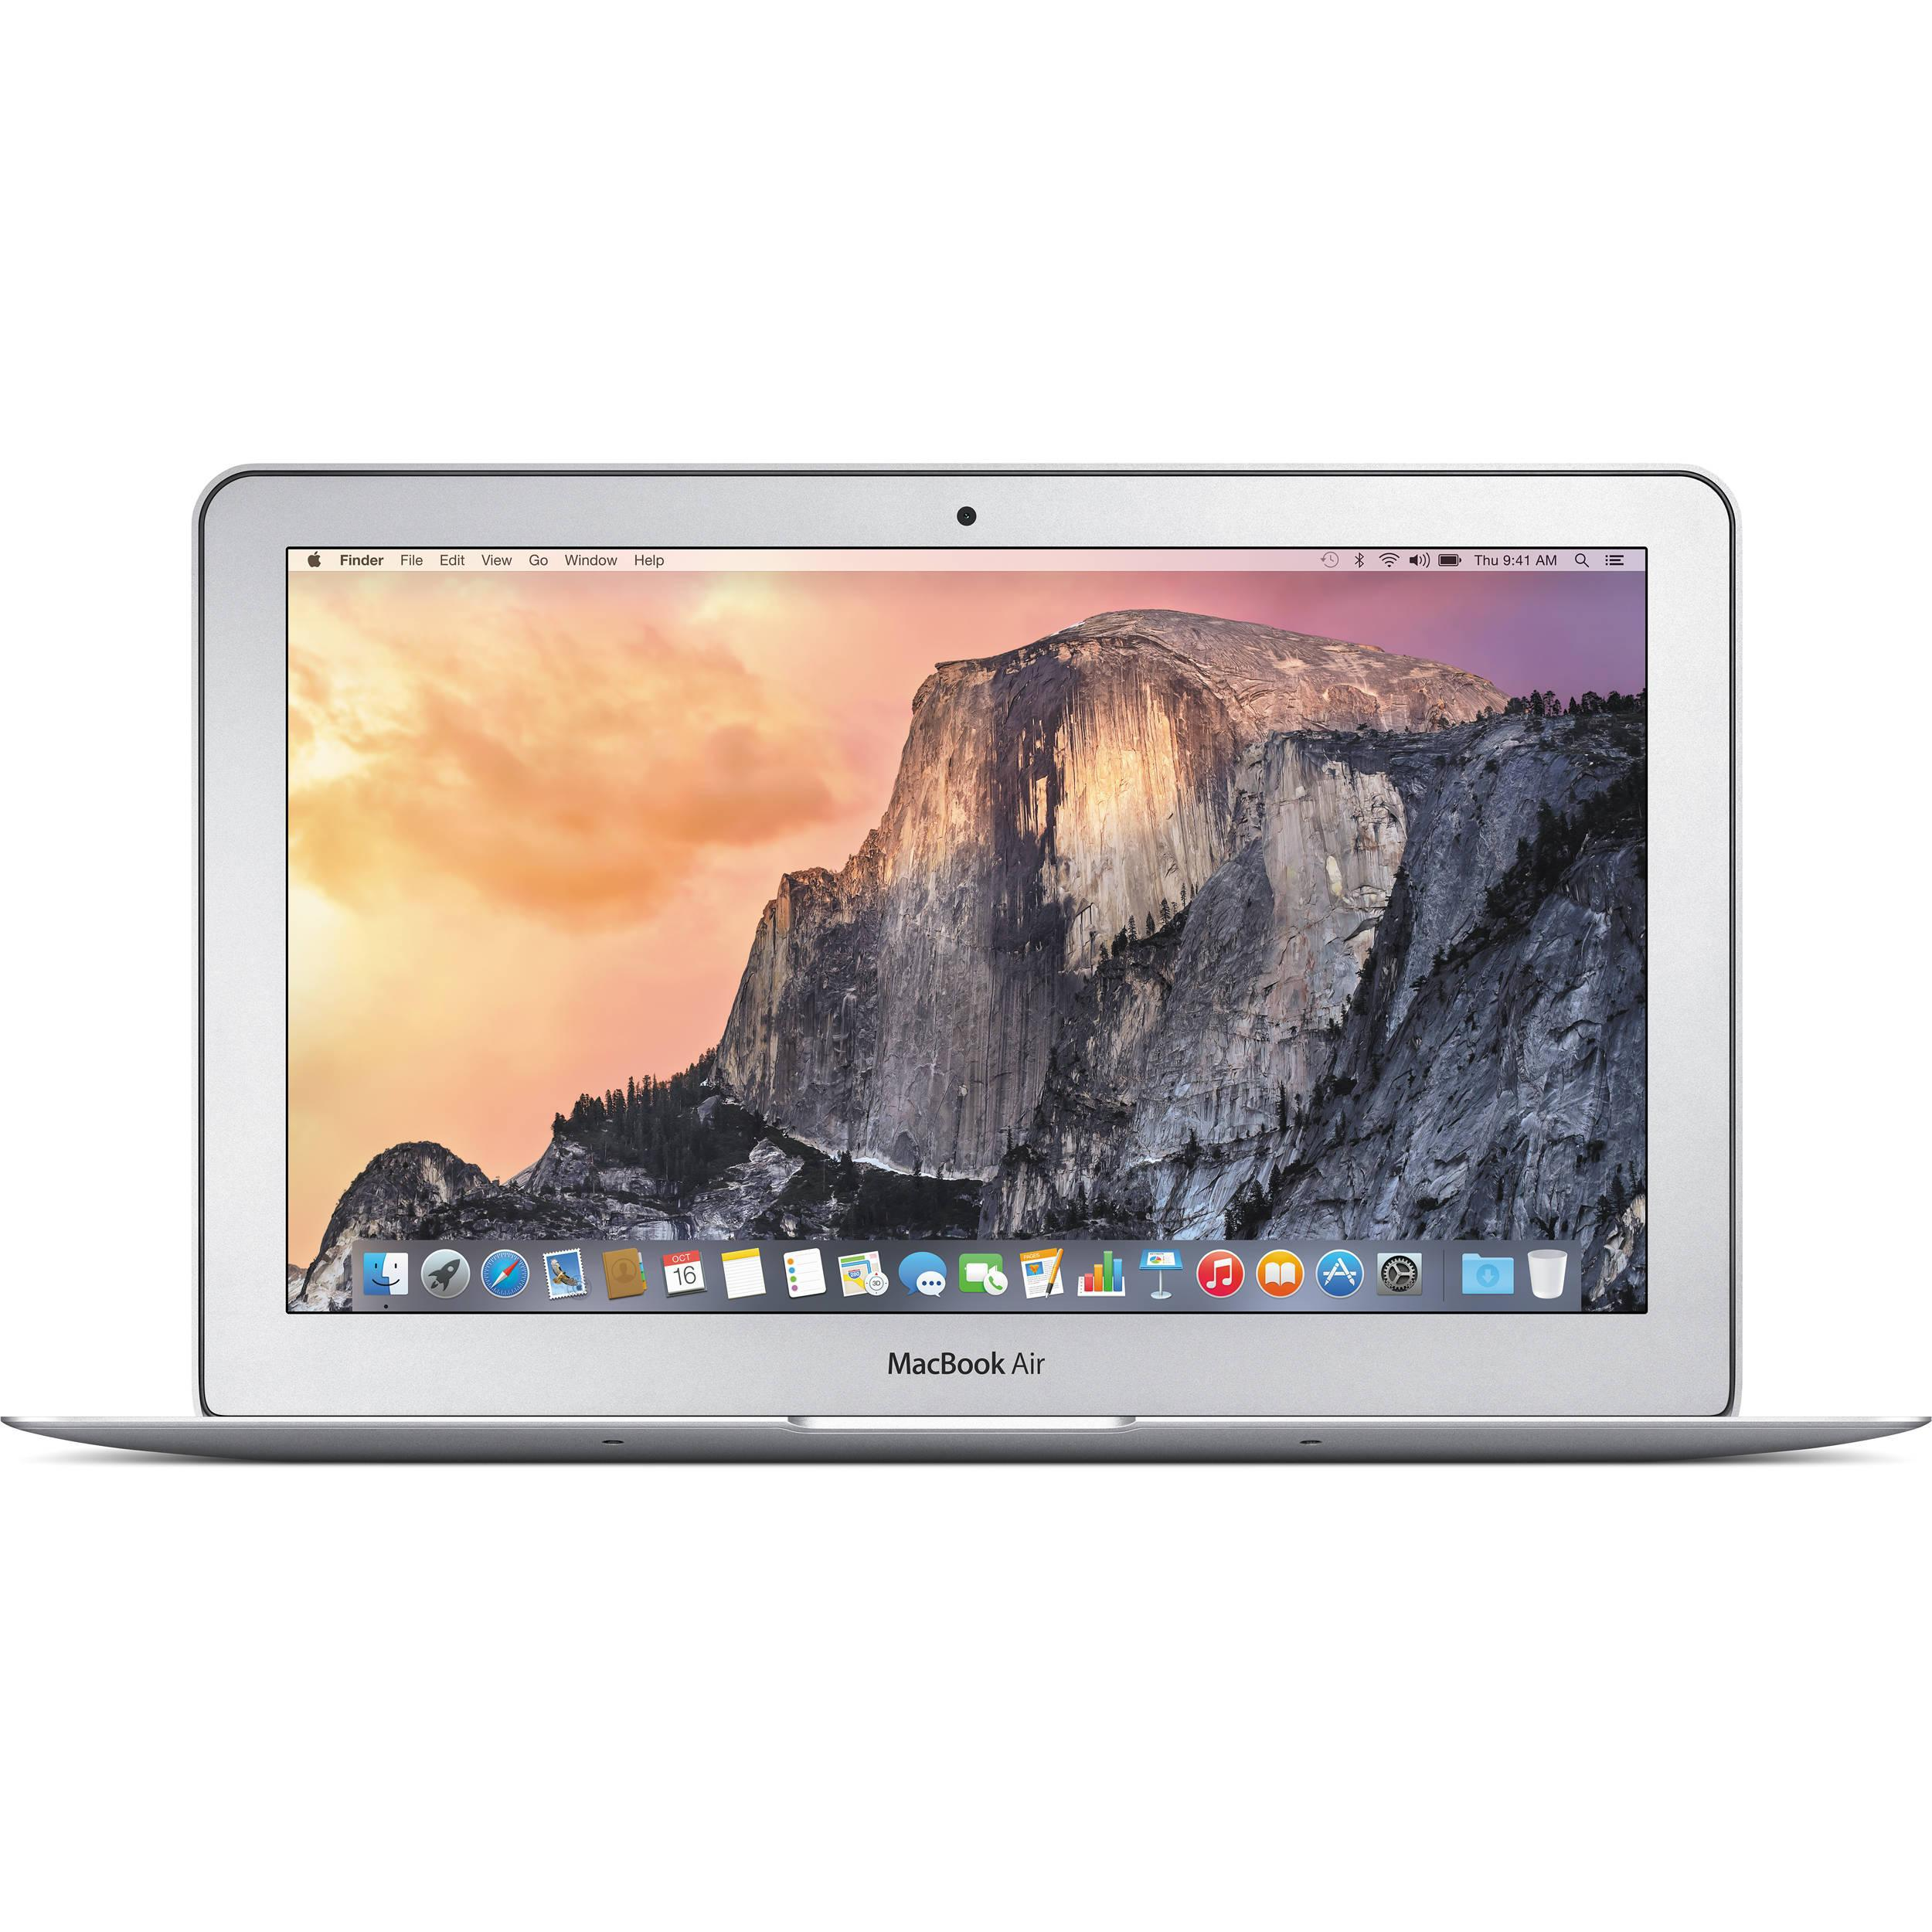 macbook air 11 core i5 1 6 ghz ssd 128 go ram 4 go. Black Bedroom Furniture Sets. Home Design Ideas